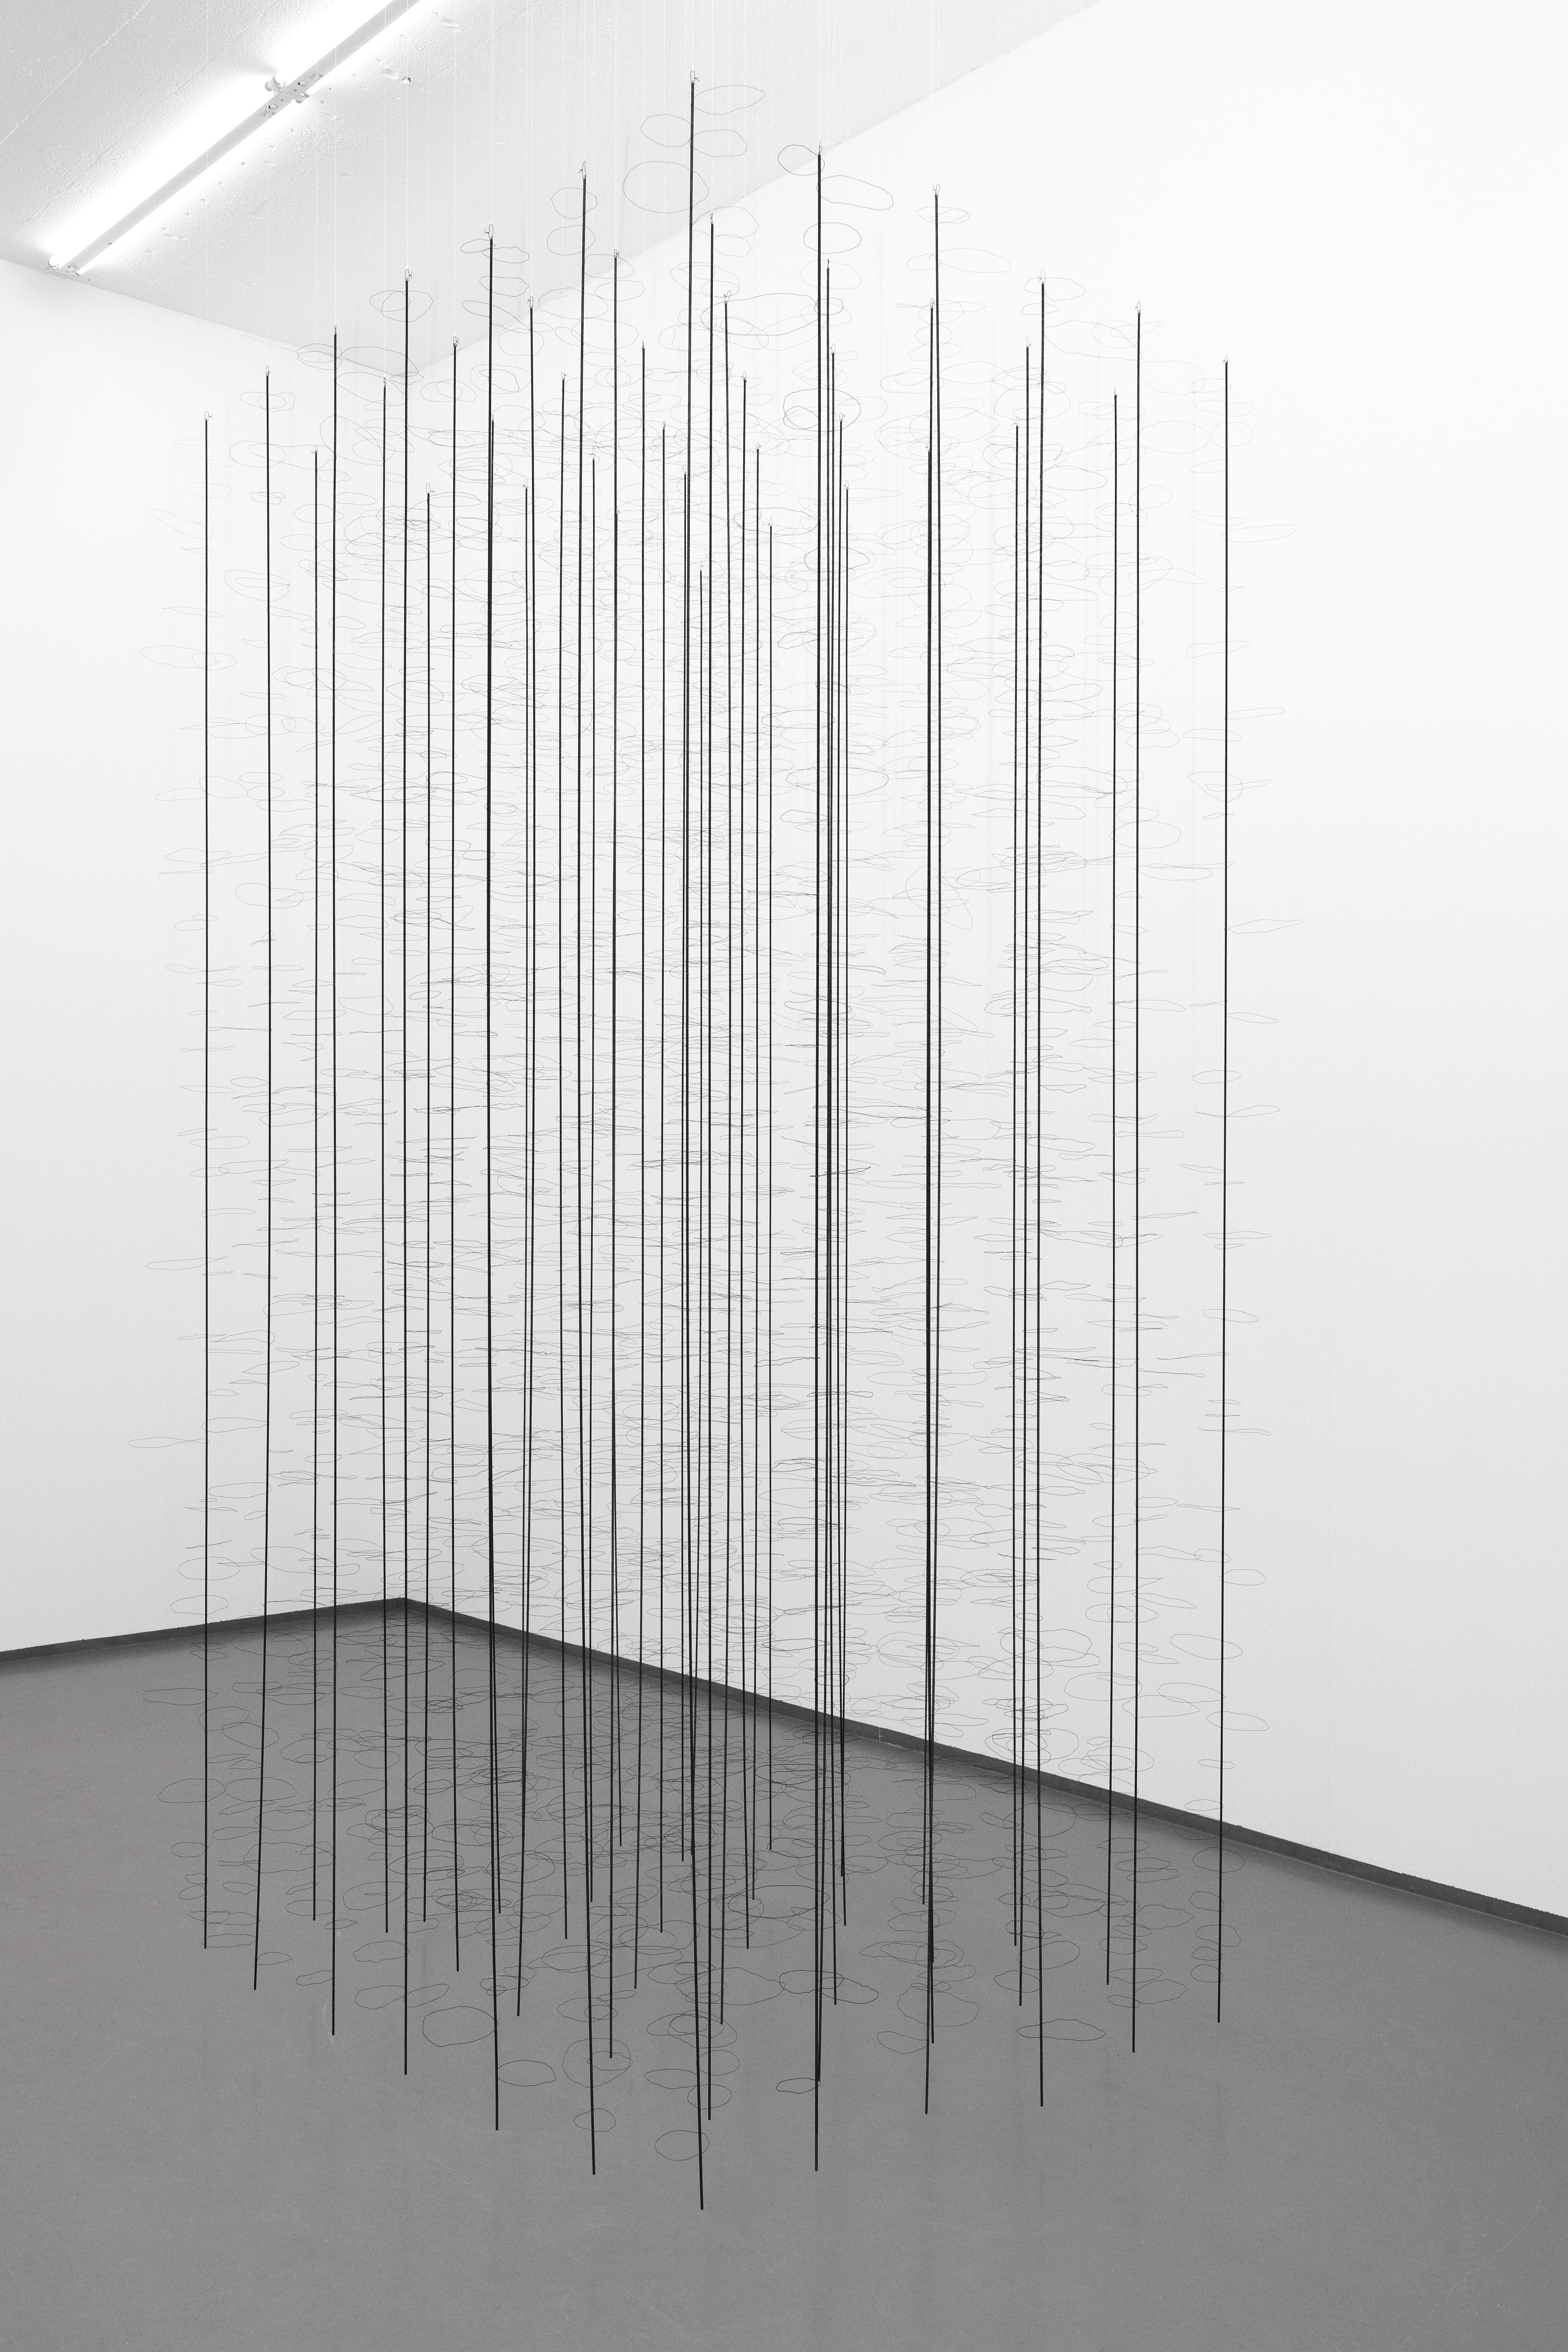 Sculpture I, 2010, steel, 300 x 155 x 180 cm